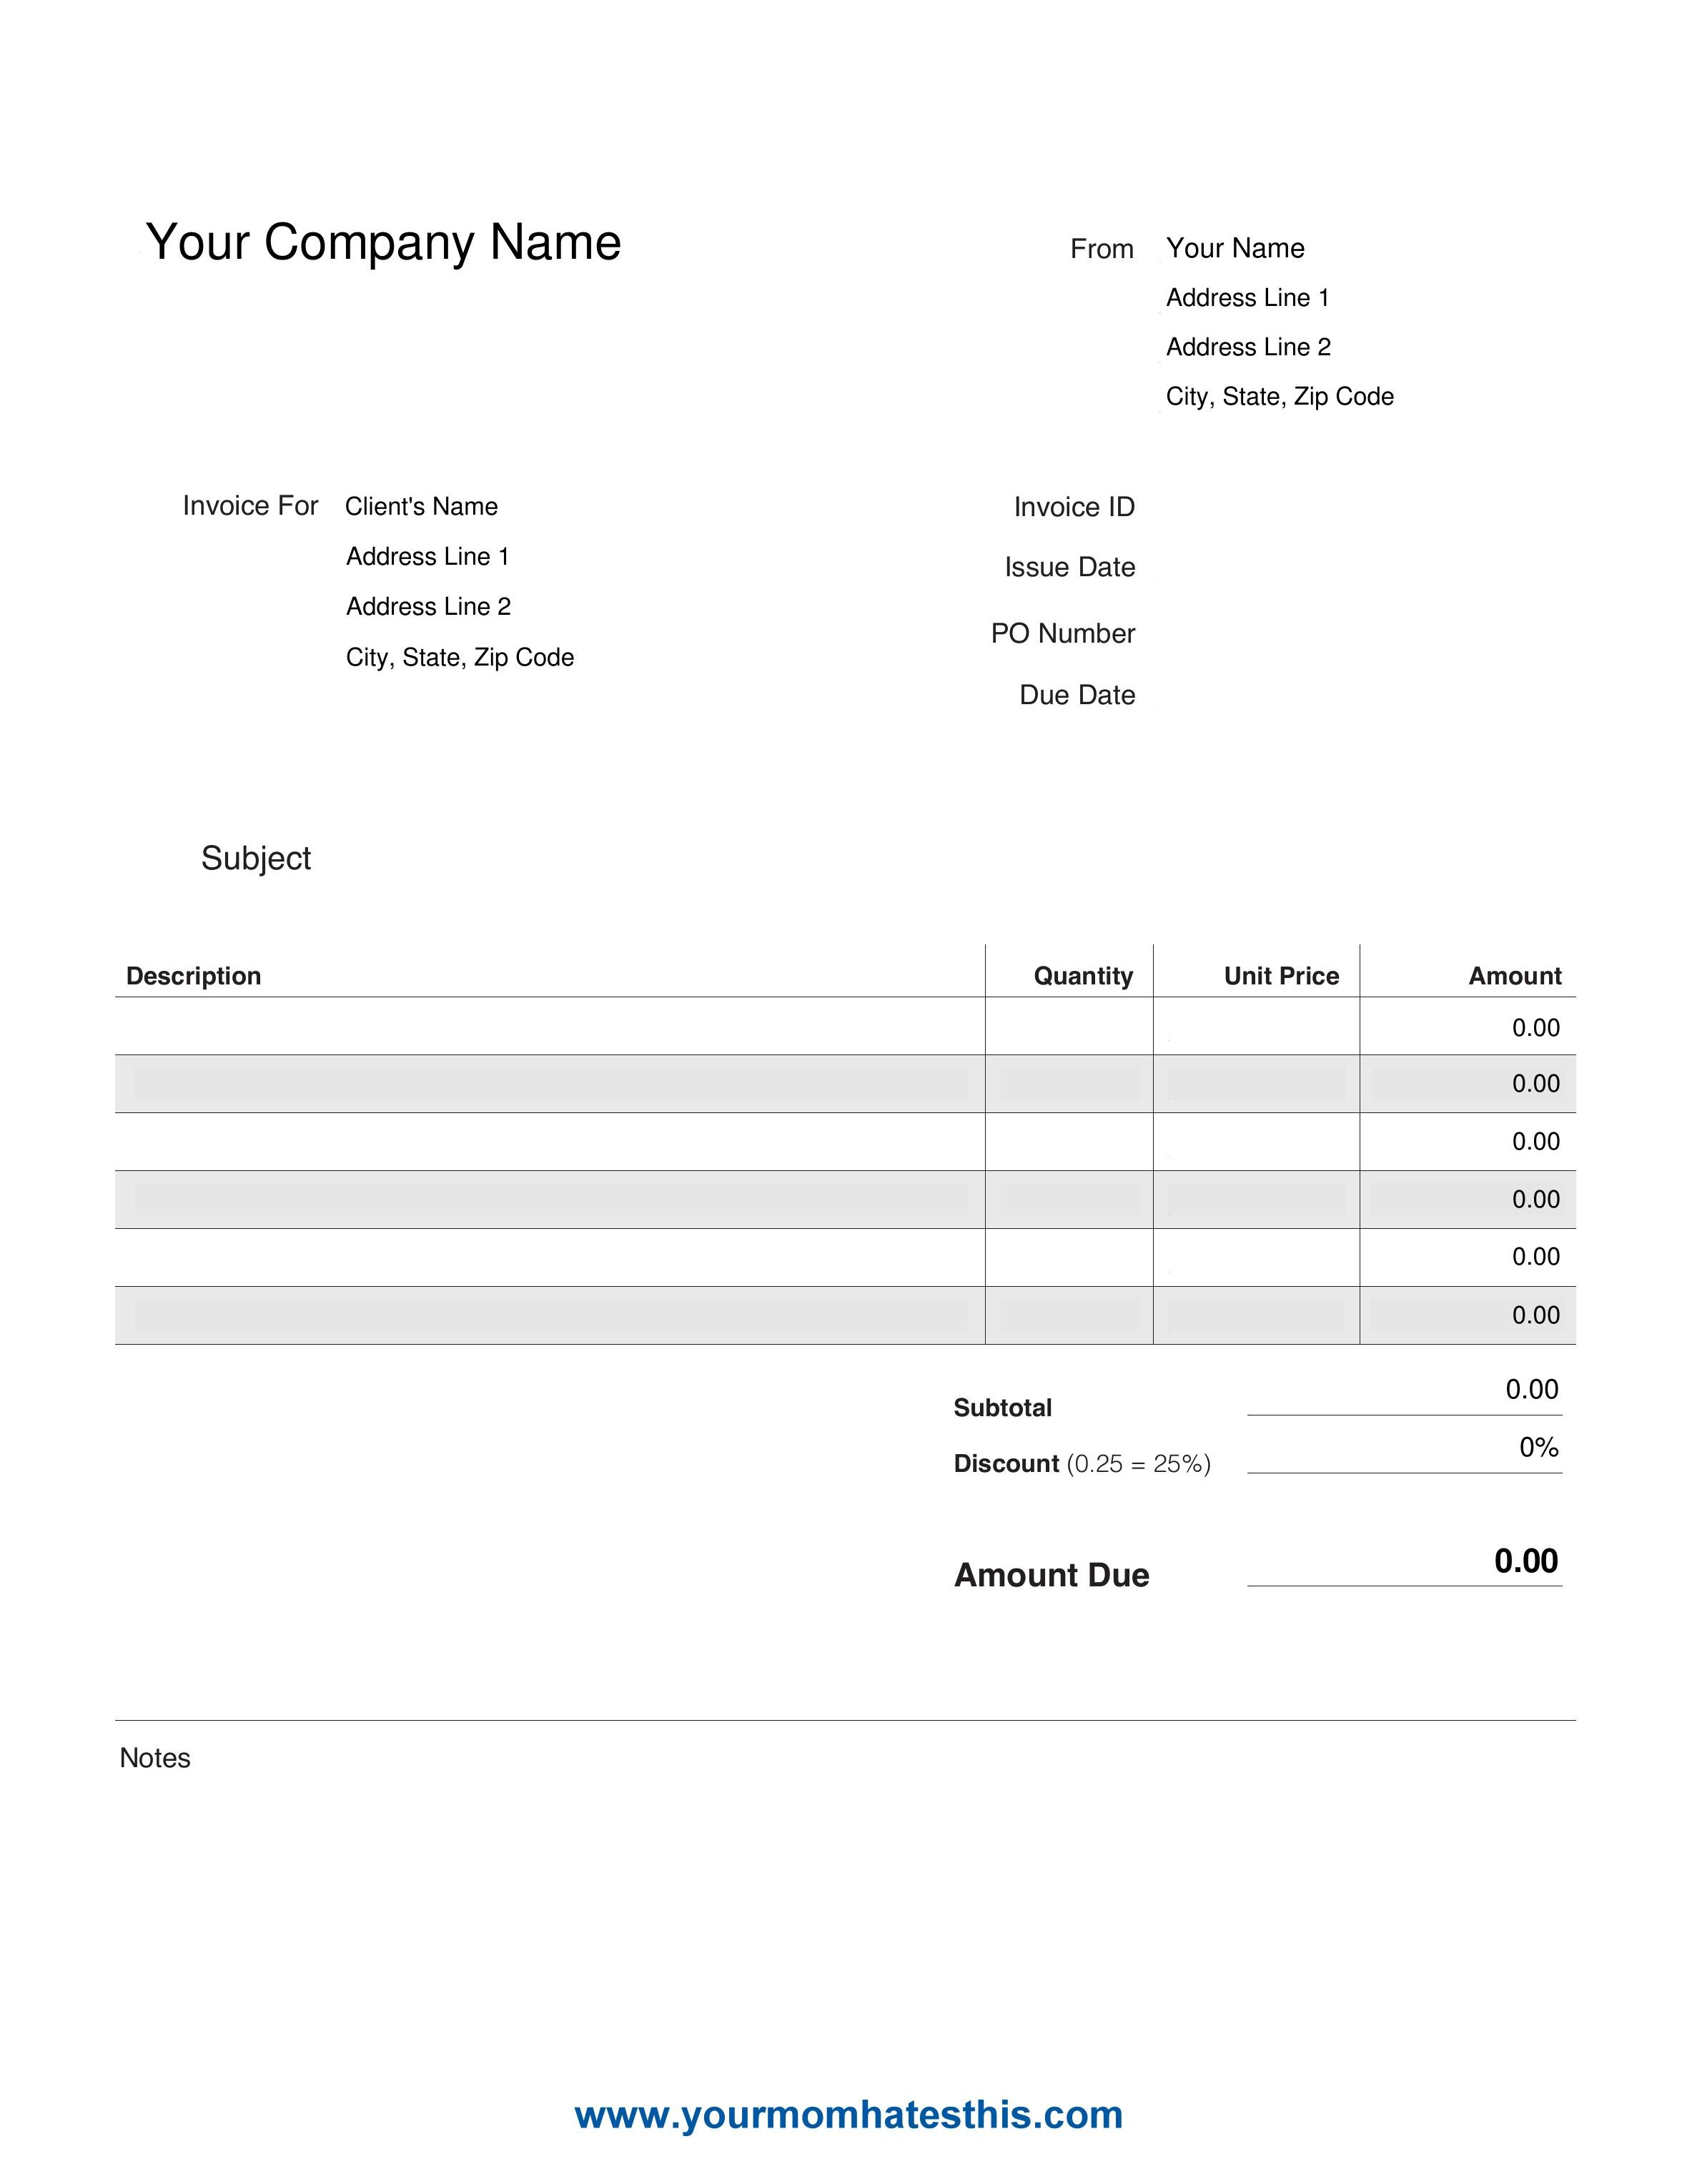 Custom Invoice Format Excel